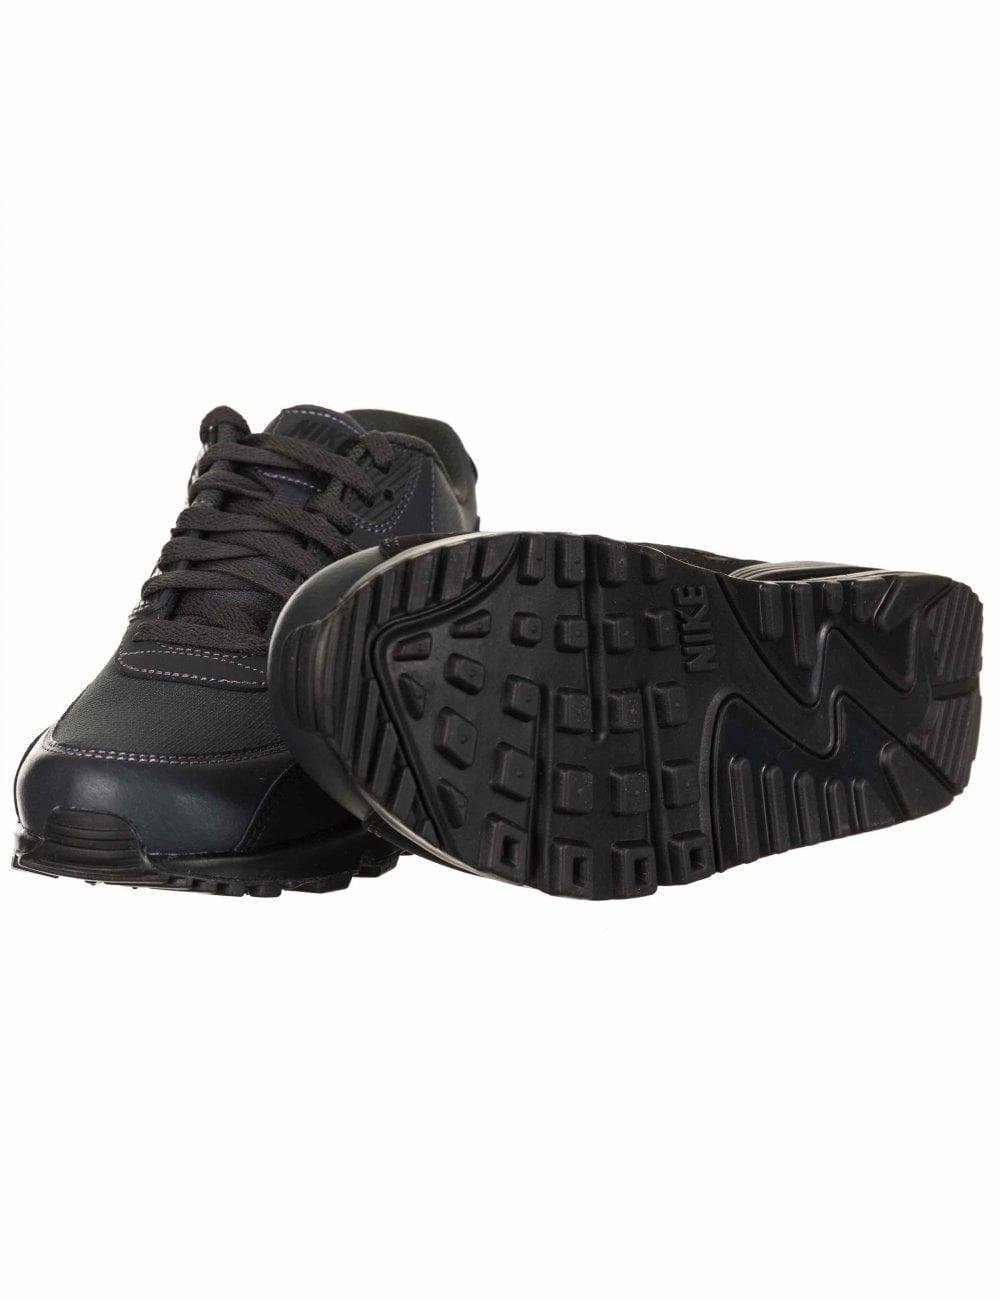 good quality big discount pretty cheap Nike Air Max 90 Essential Trainers - Black/Anthracite - Footwear ...